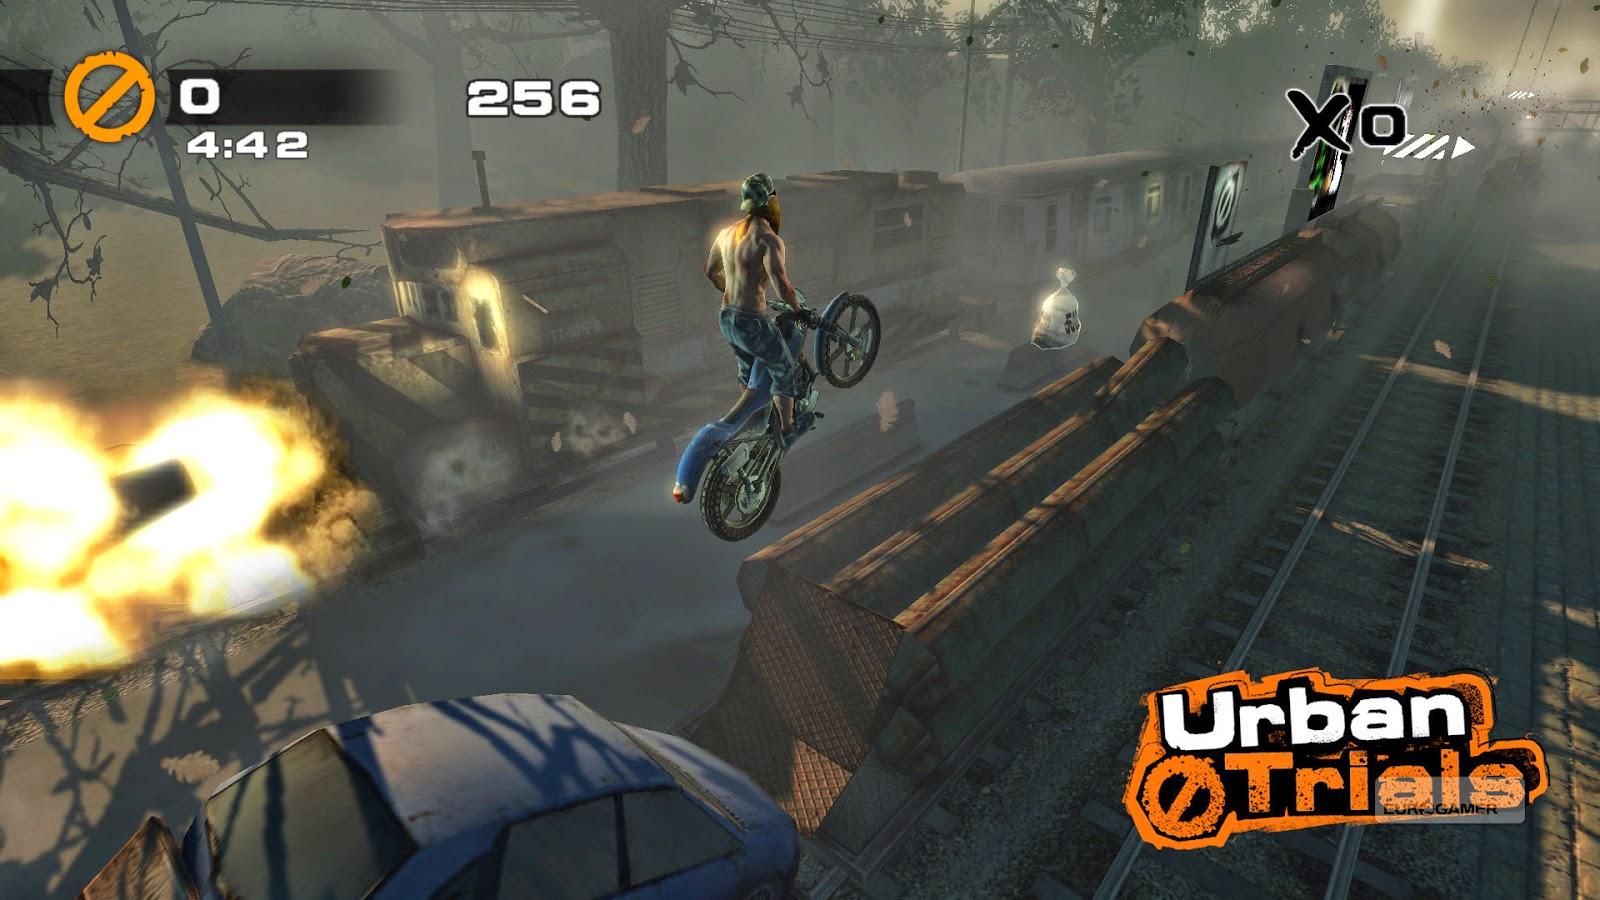 شرح تحميل و تثبيث لعبة URBAN Trial Freestyle مضغوطة بحجمشرح تحميل و تثبيث لعبة URBAN Trial Freestyle مضغوطة بحجم 230MB 230MB